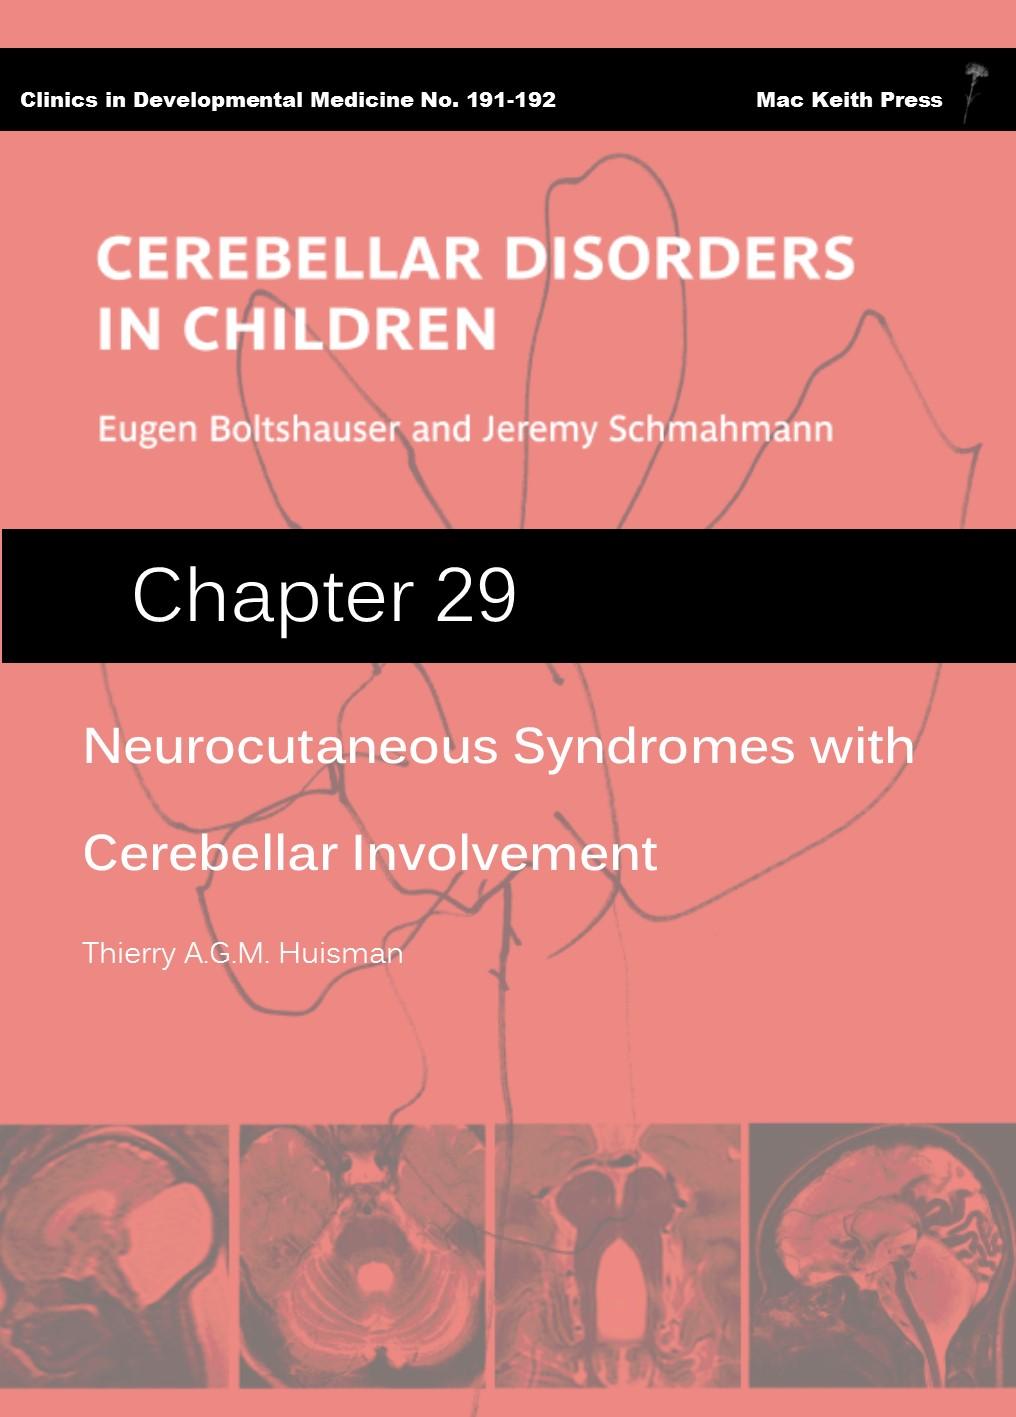 Neurocutaneous Syndromes with Cerebellar Involvement - Cerebellar Disorders in Children (Chapter 29) COVER